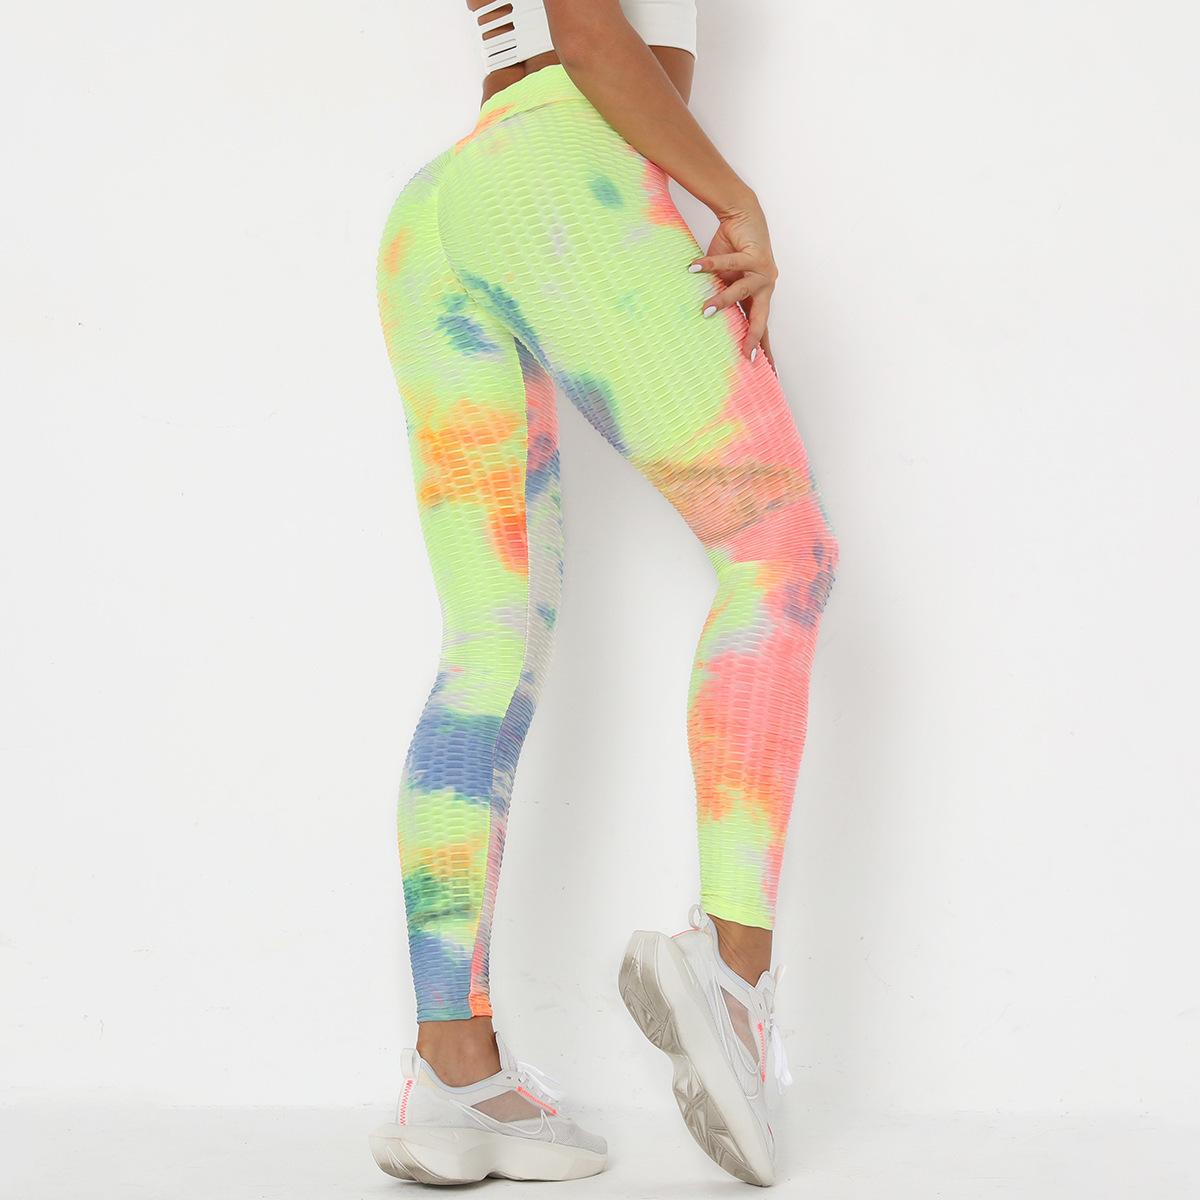 stitching tie-dye ink jacquard slim fitness leggings NSLX8998